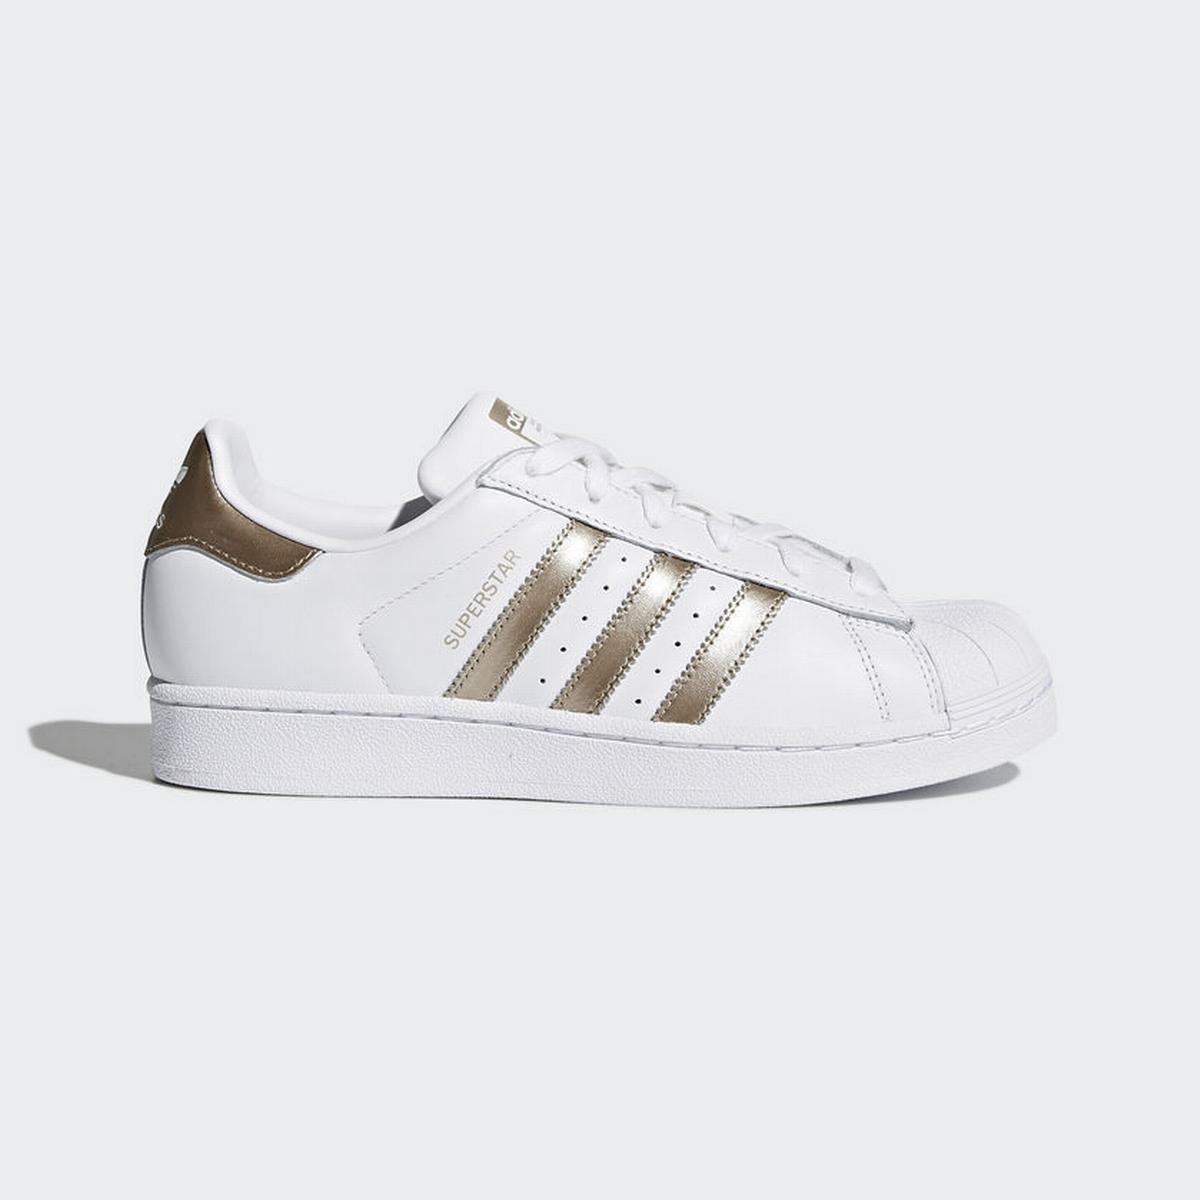 adidas Sverige | Herr Dam Adidas Superstar Vit Guld Tongue